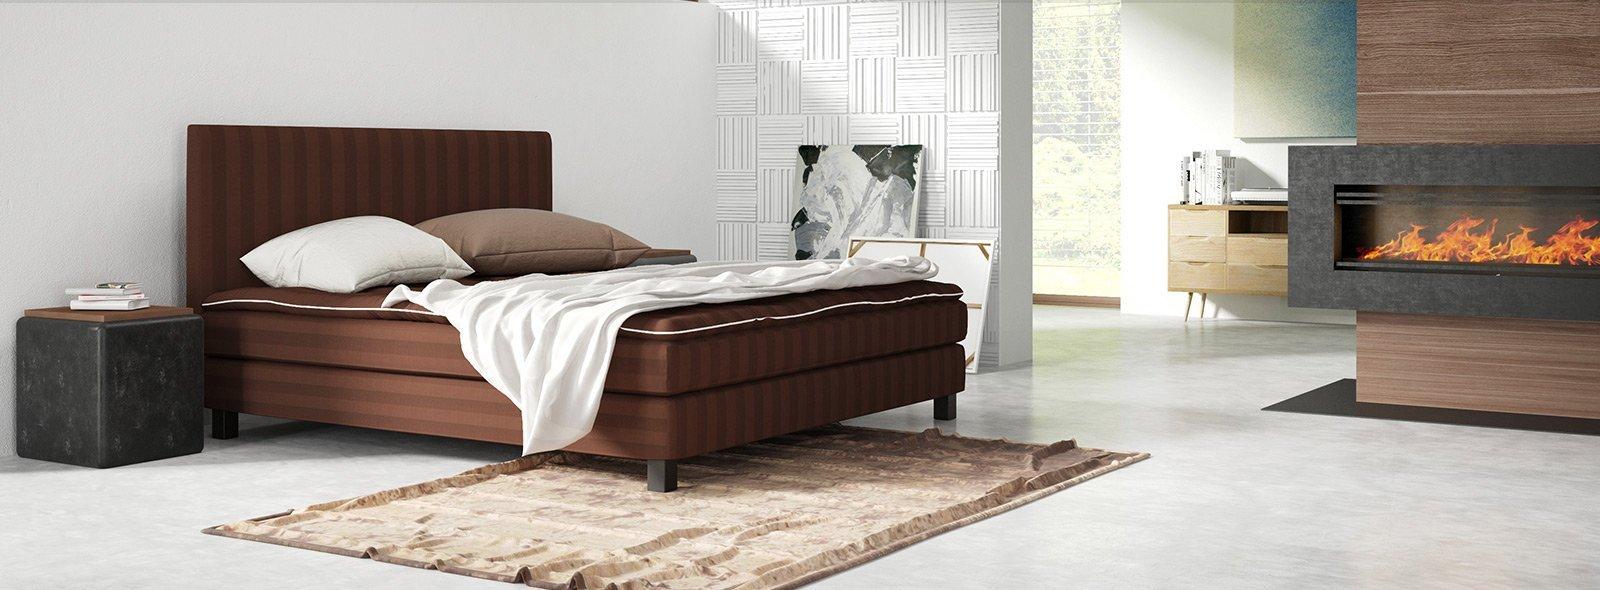 Postel Nuova od firmy Saffron Beds.